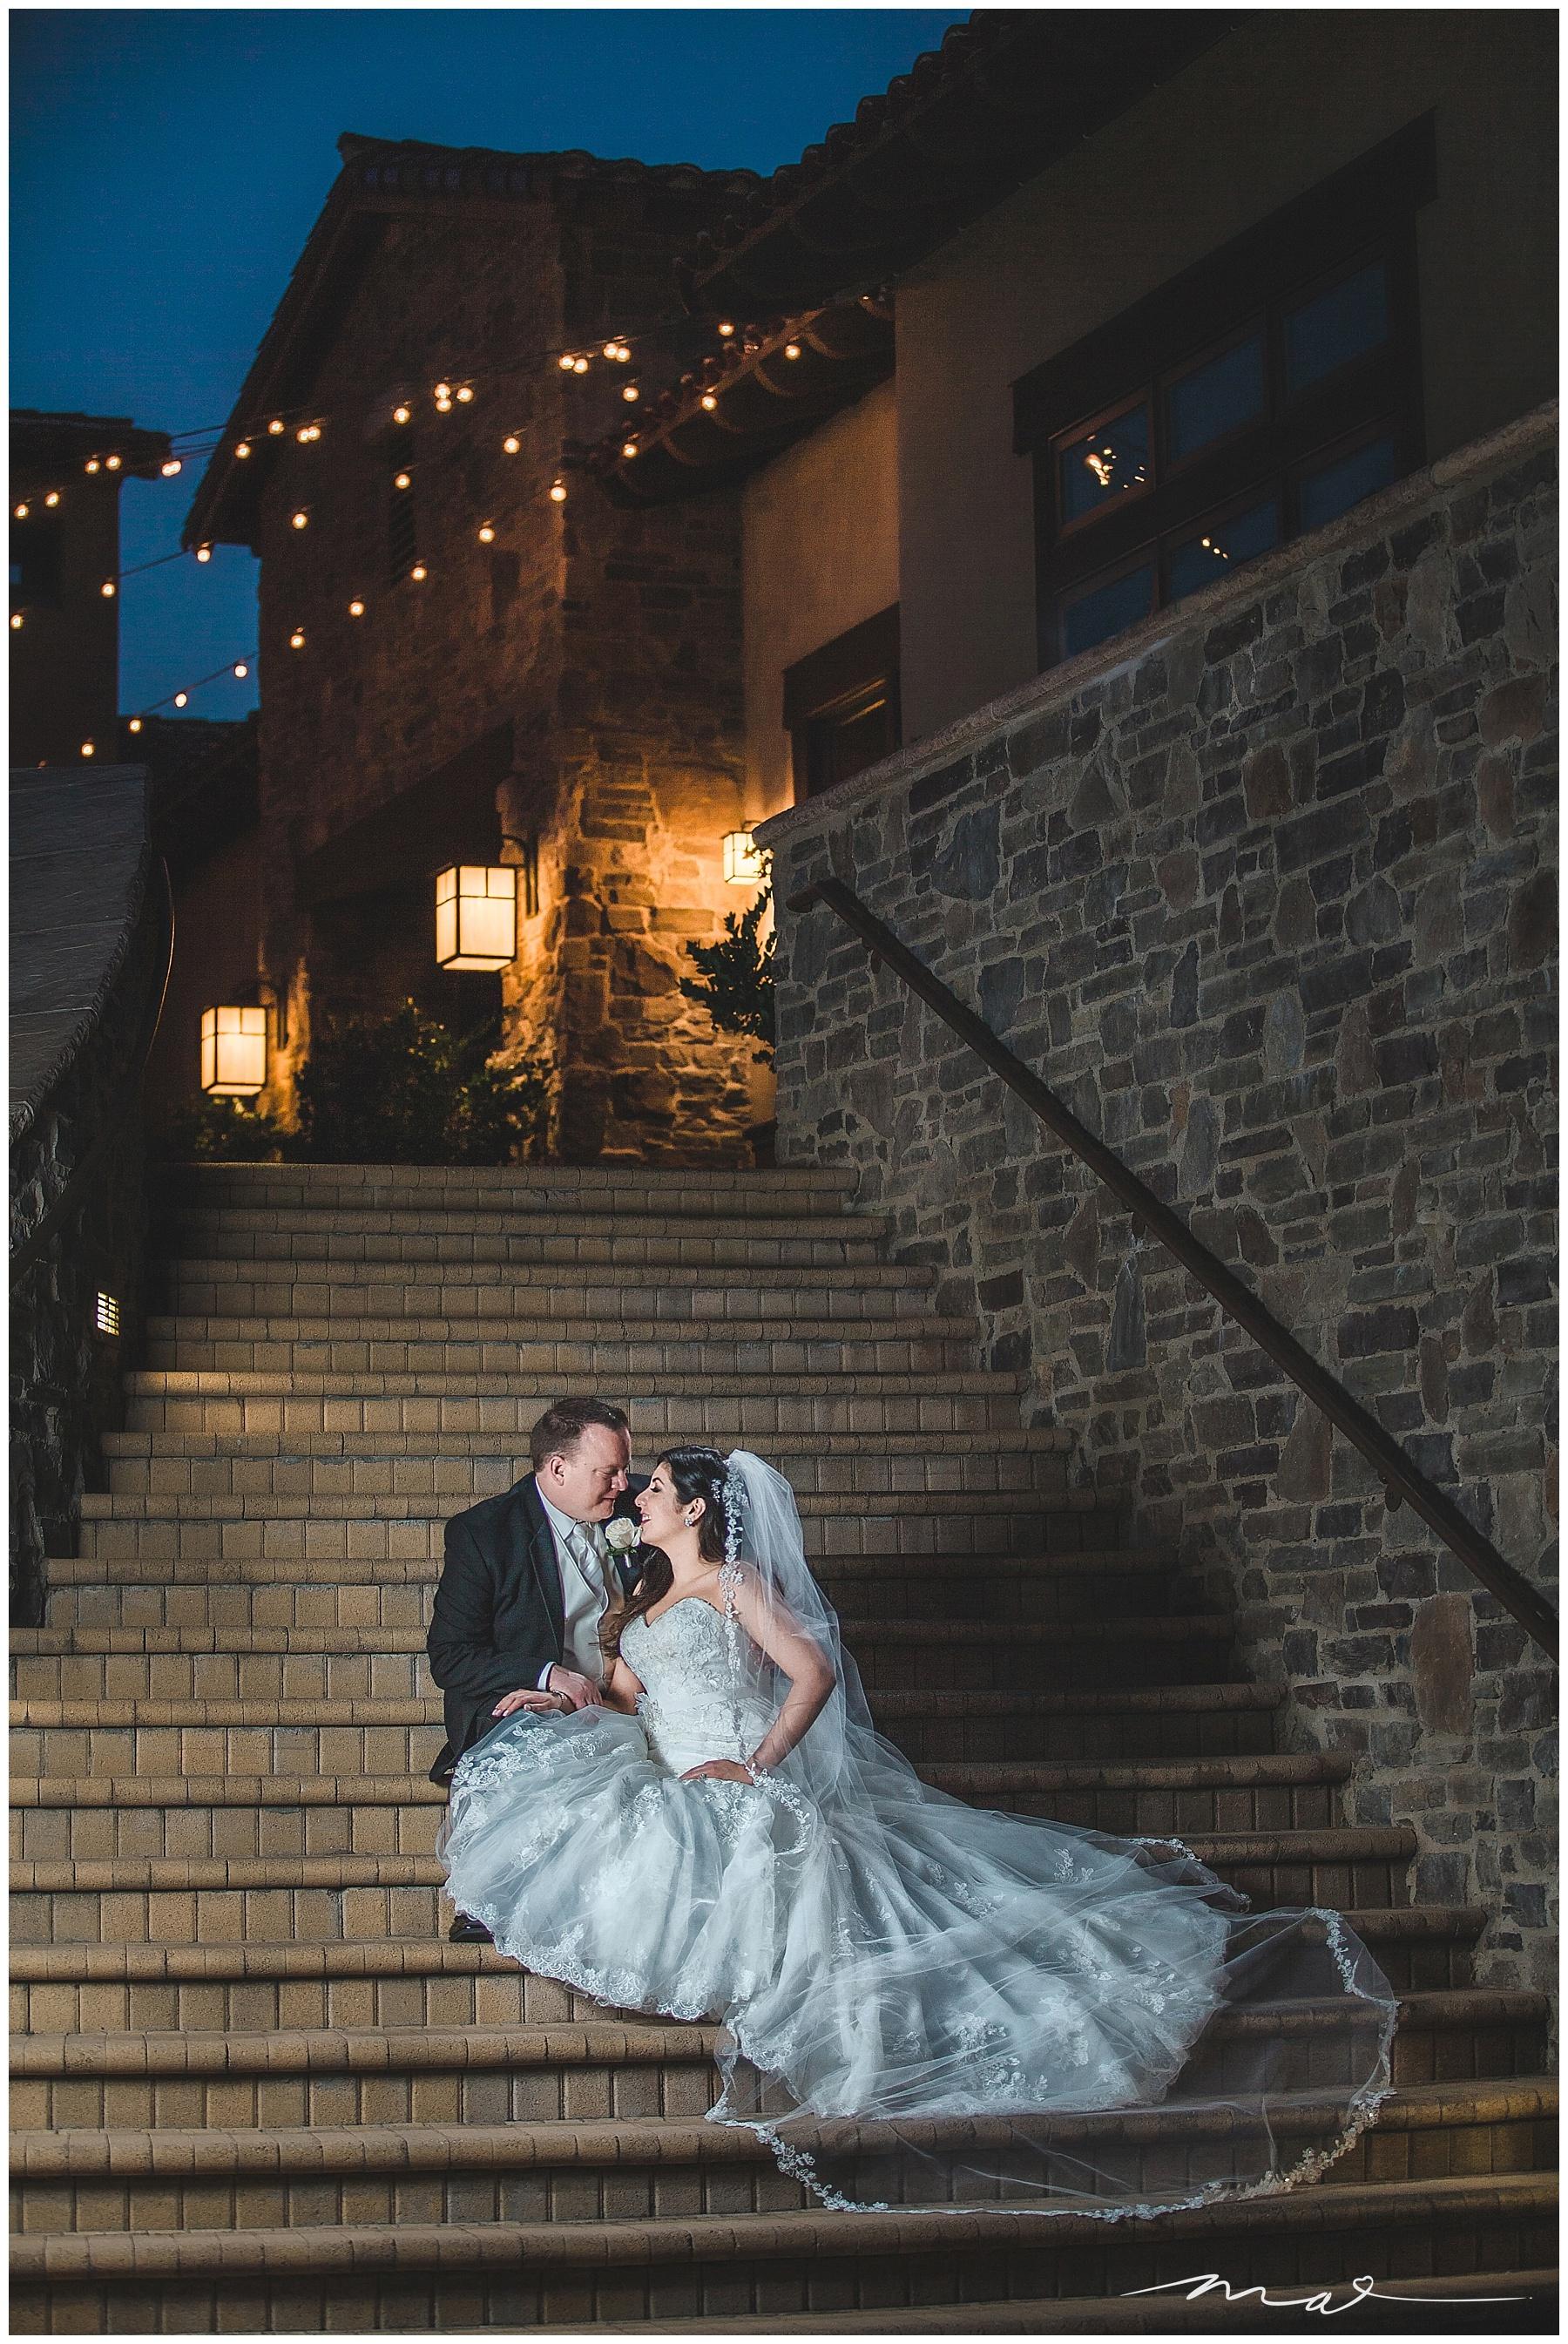 TPC Valencia Wedding Venue has a beautiful reception site that allows for gorgeous night photos